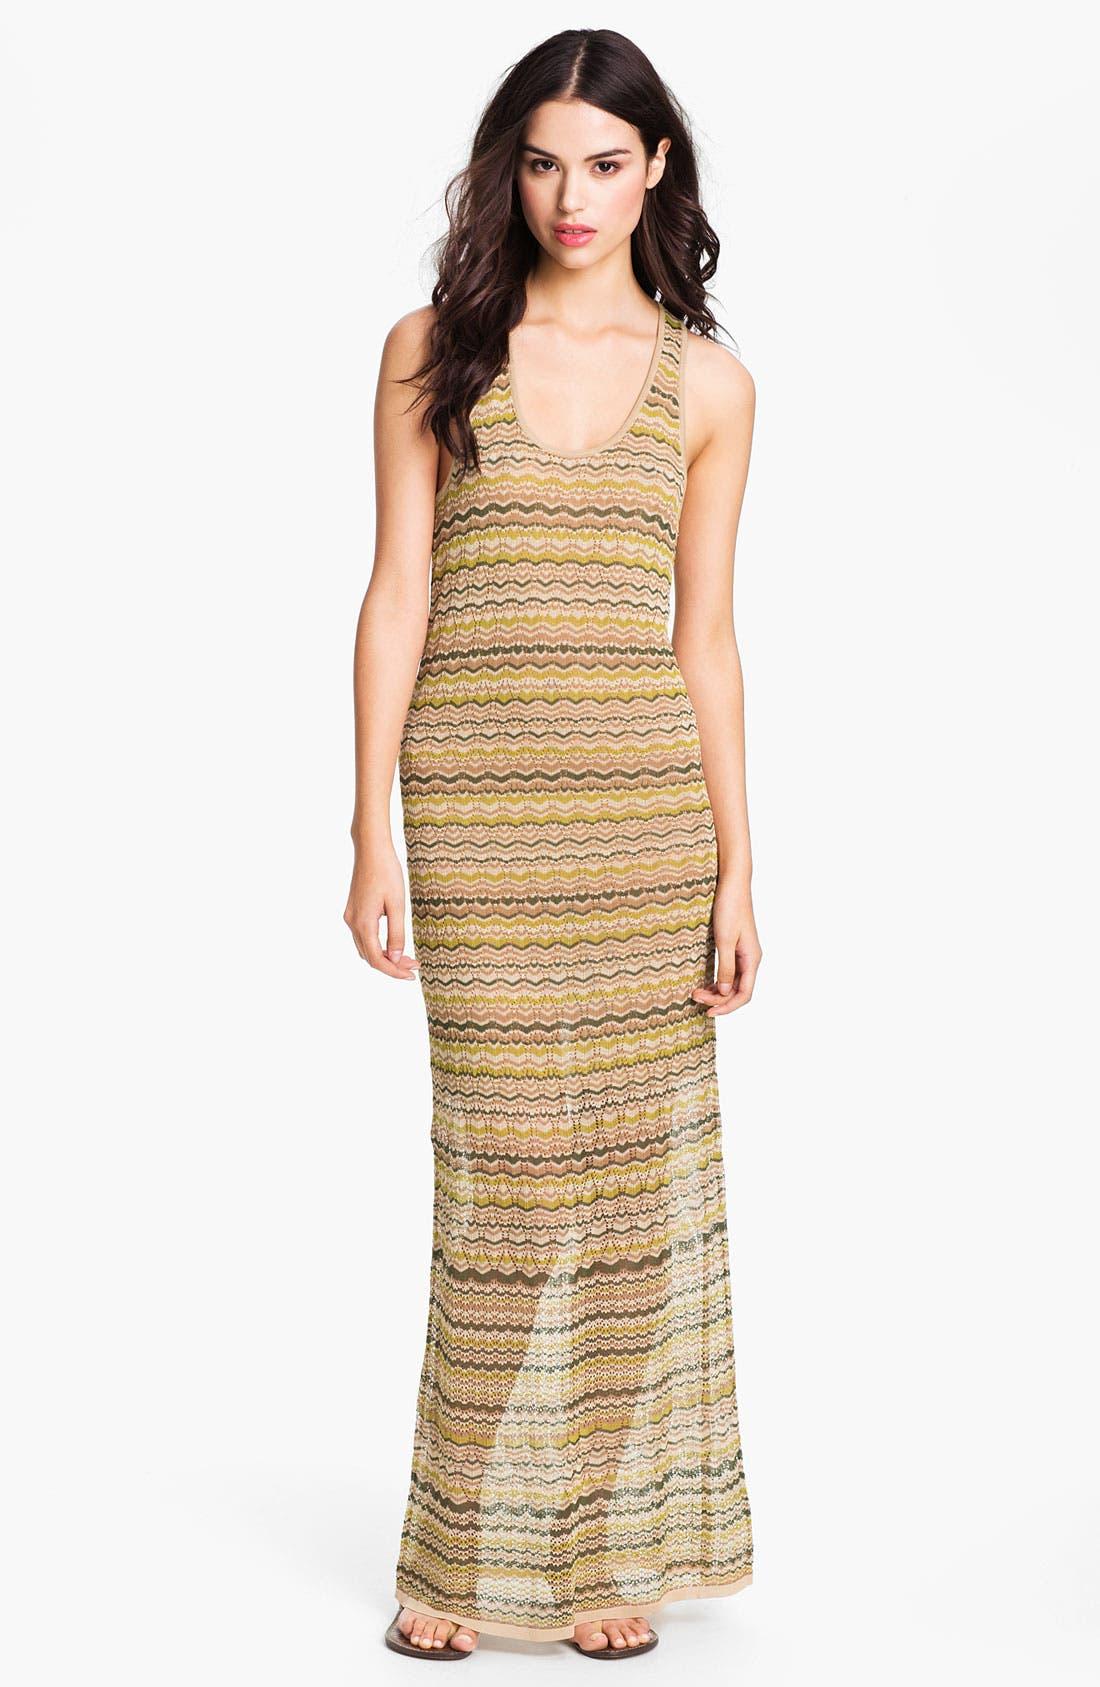 Main Image - Haute Hippie Flame Knit Racerback Maxi Dress